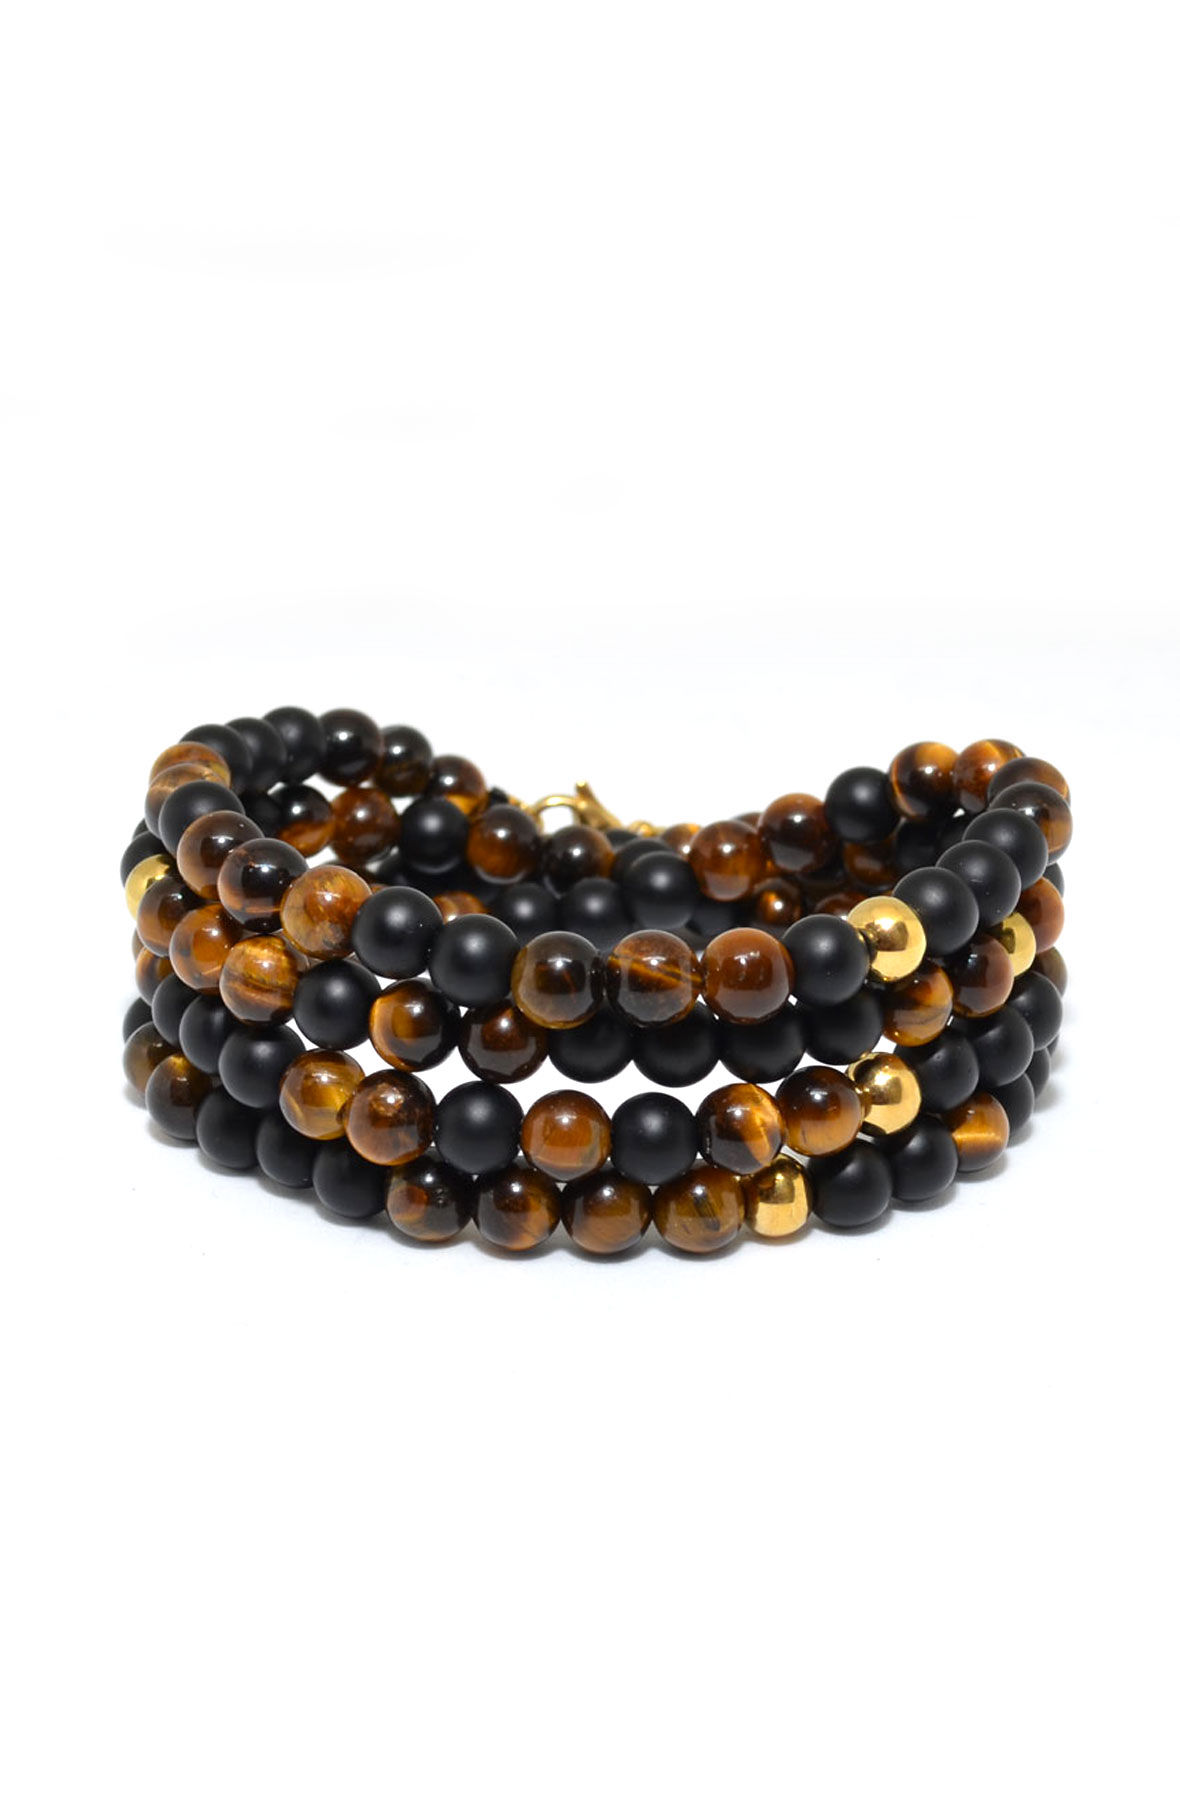 Image of Tiger Eye Gemstone Necklace